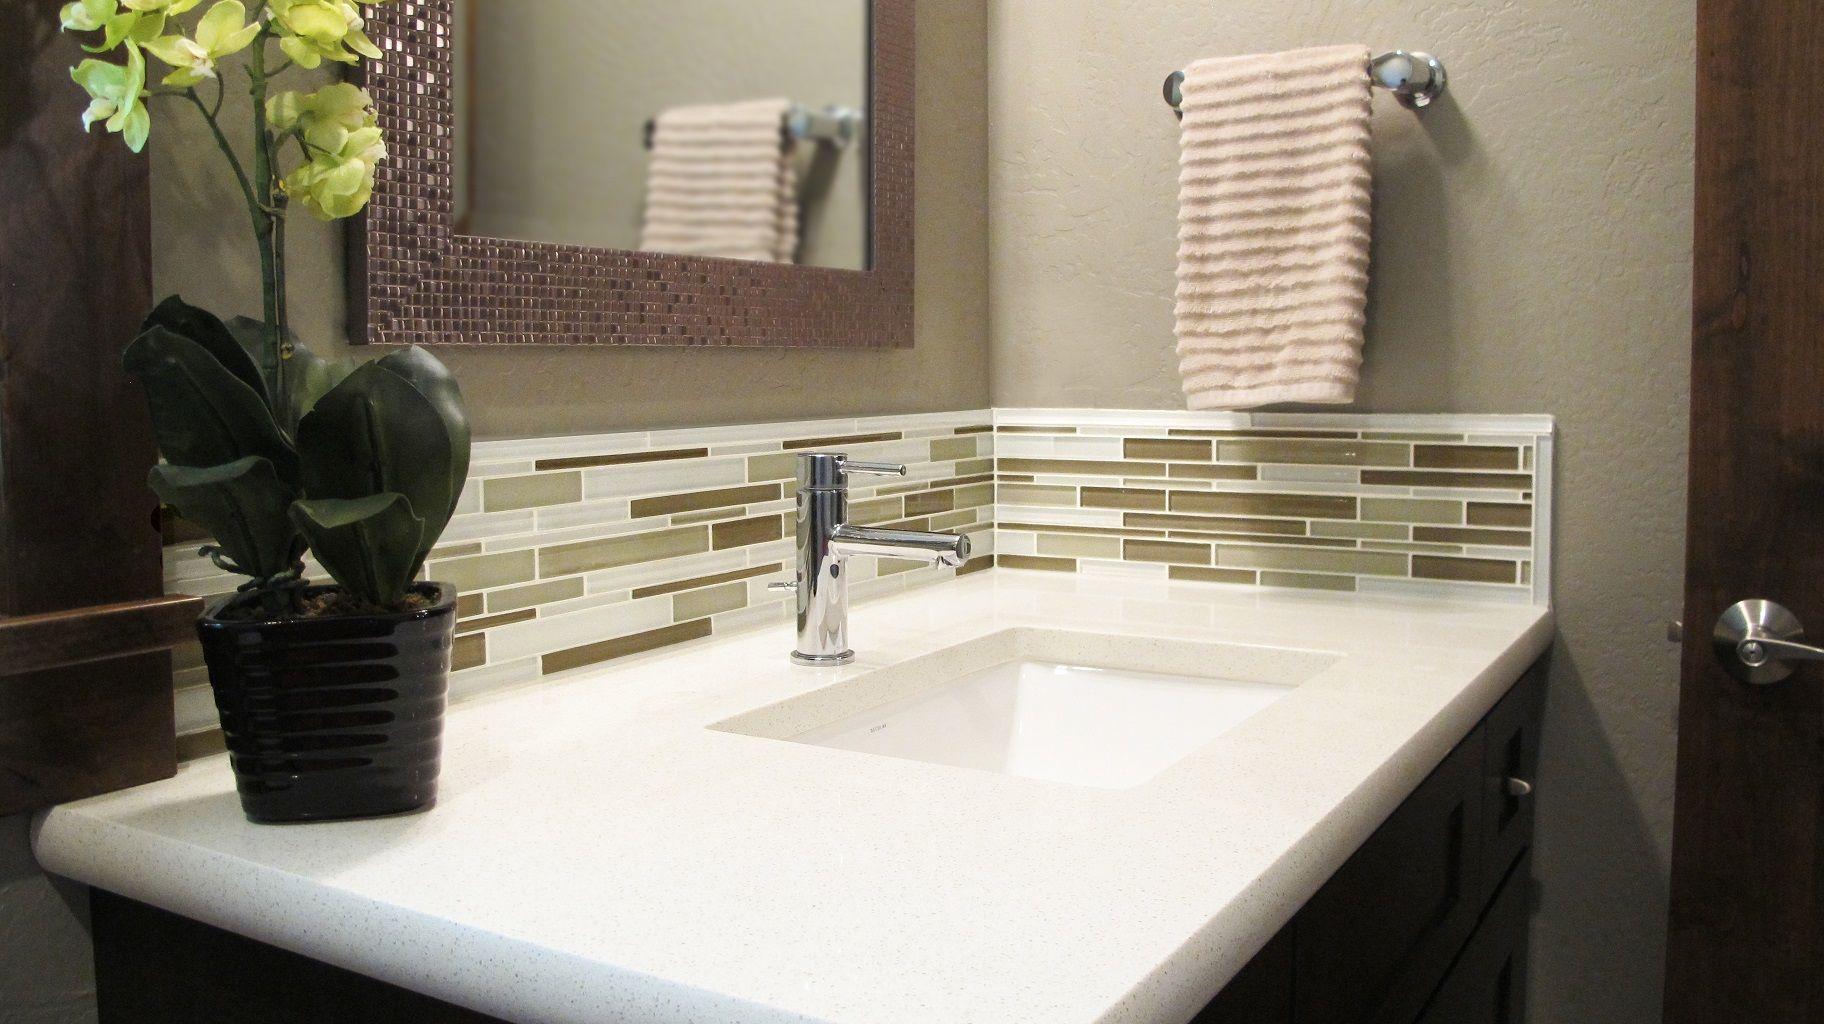 Tile Backsplash Behind Bathroom Sink Vanity Backsplash Modern